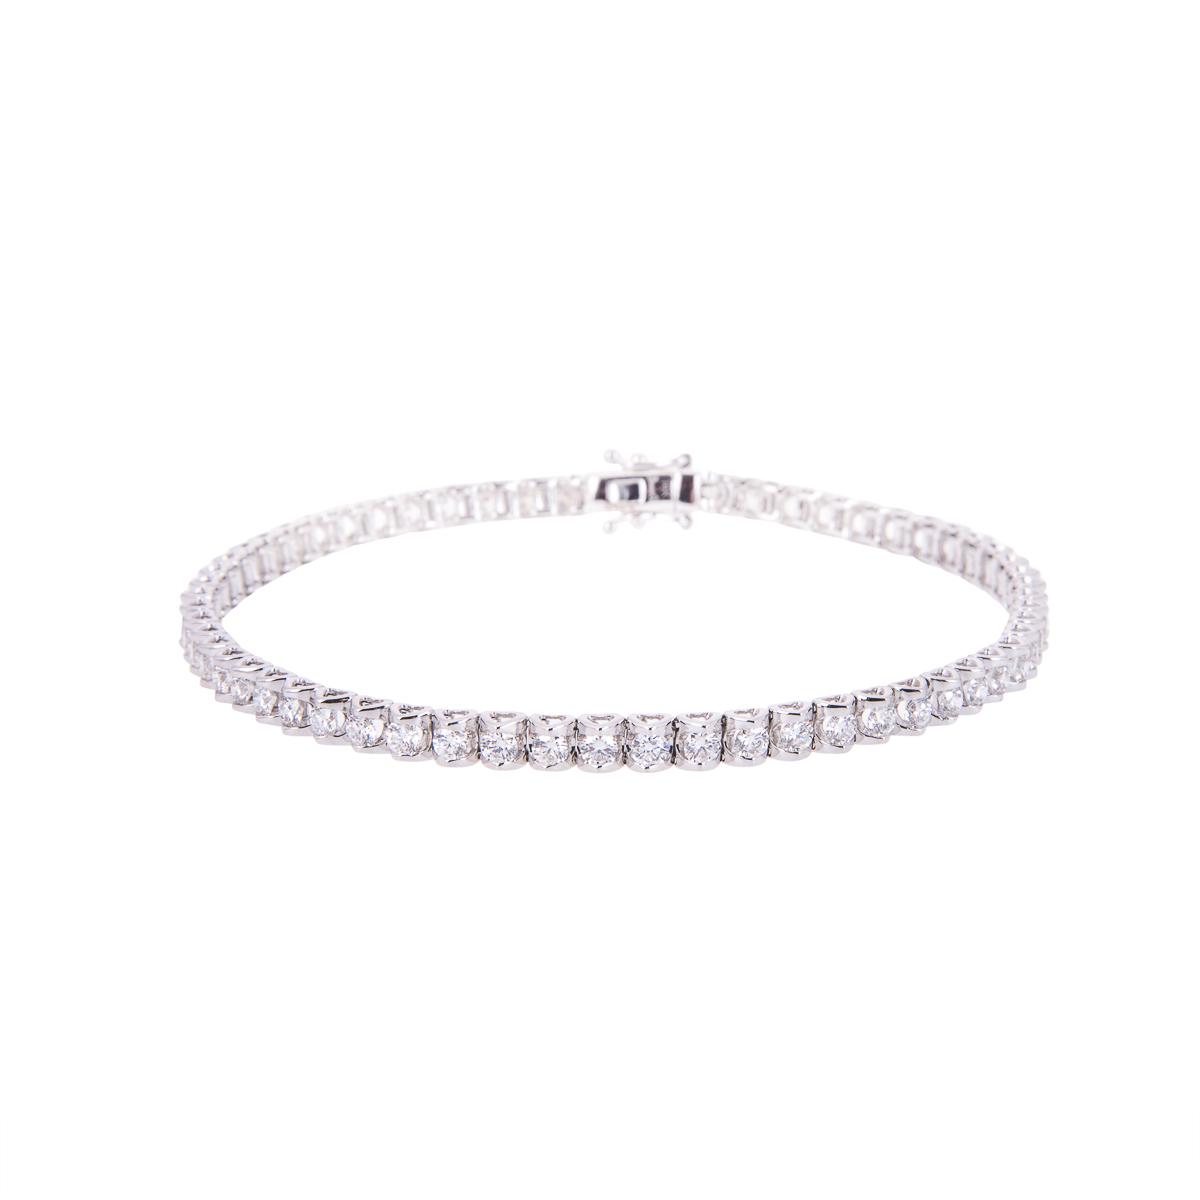 heart-shaped-collect-brilliant-cut-diamond-bracelet